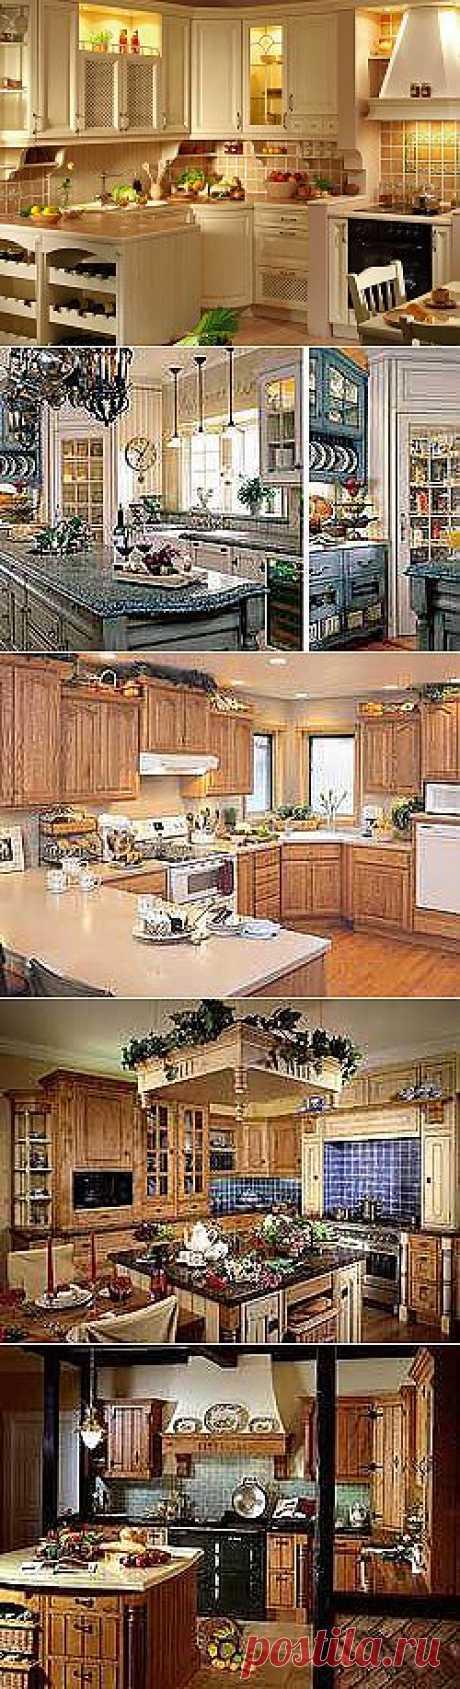 Кухни в стиле Кантри. Стиль кантри в кухонной мебели.